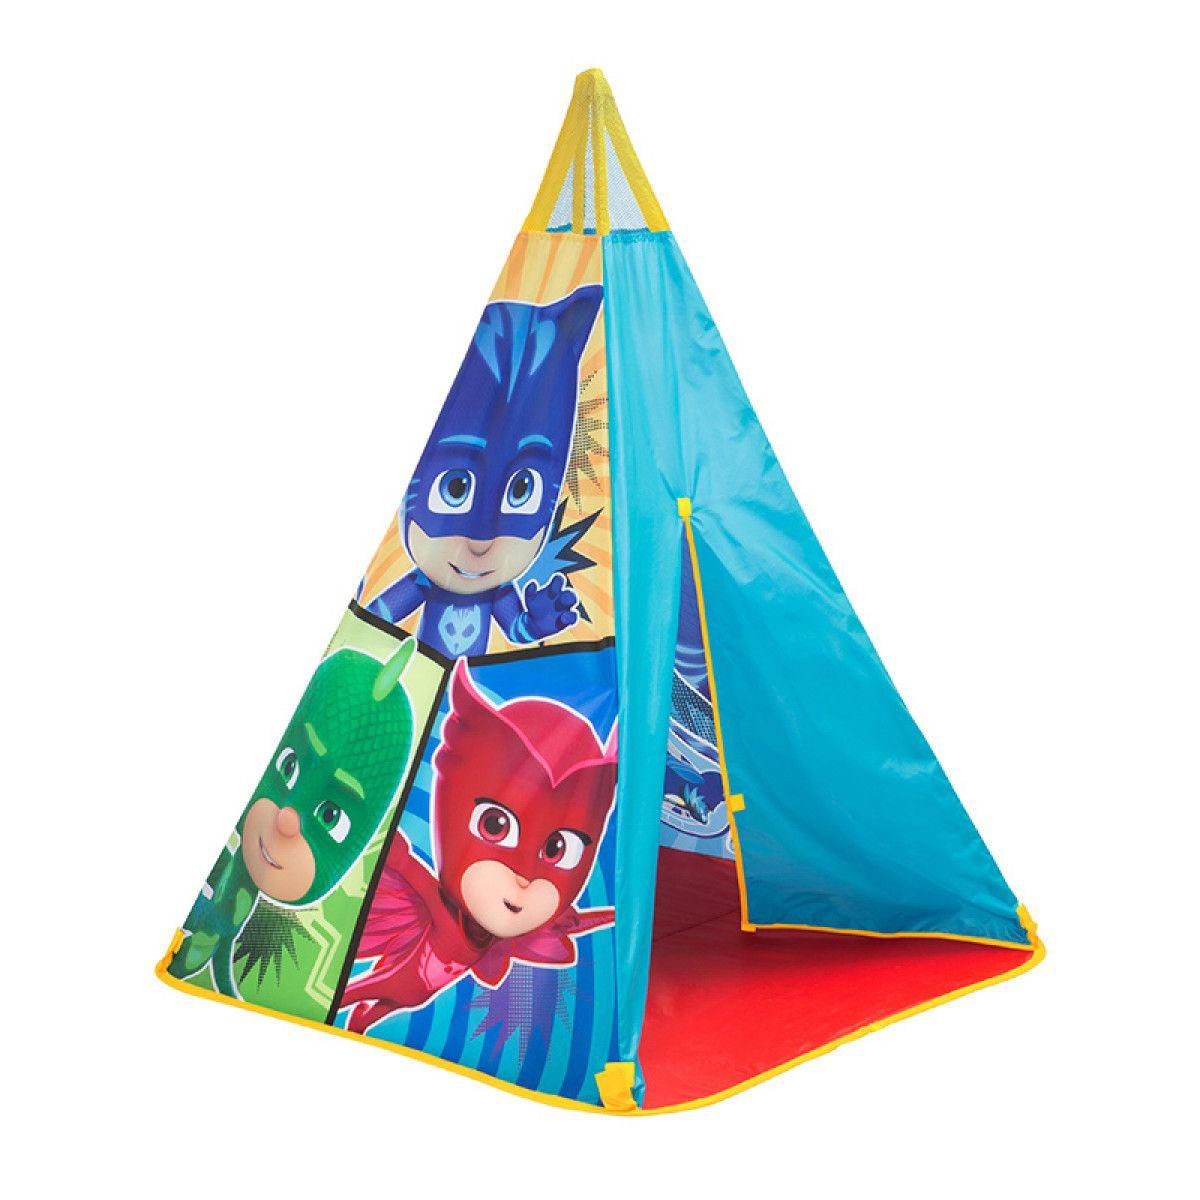 PJ Masks Teepee Play Tent In 2020